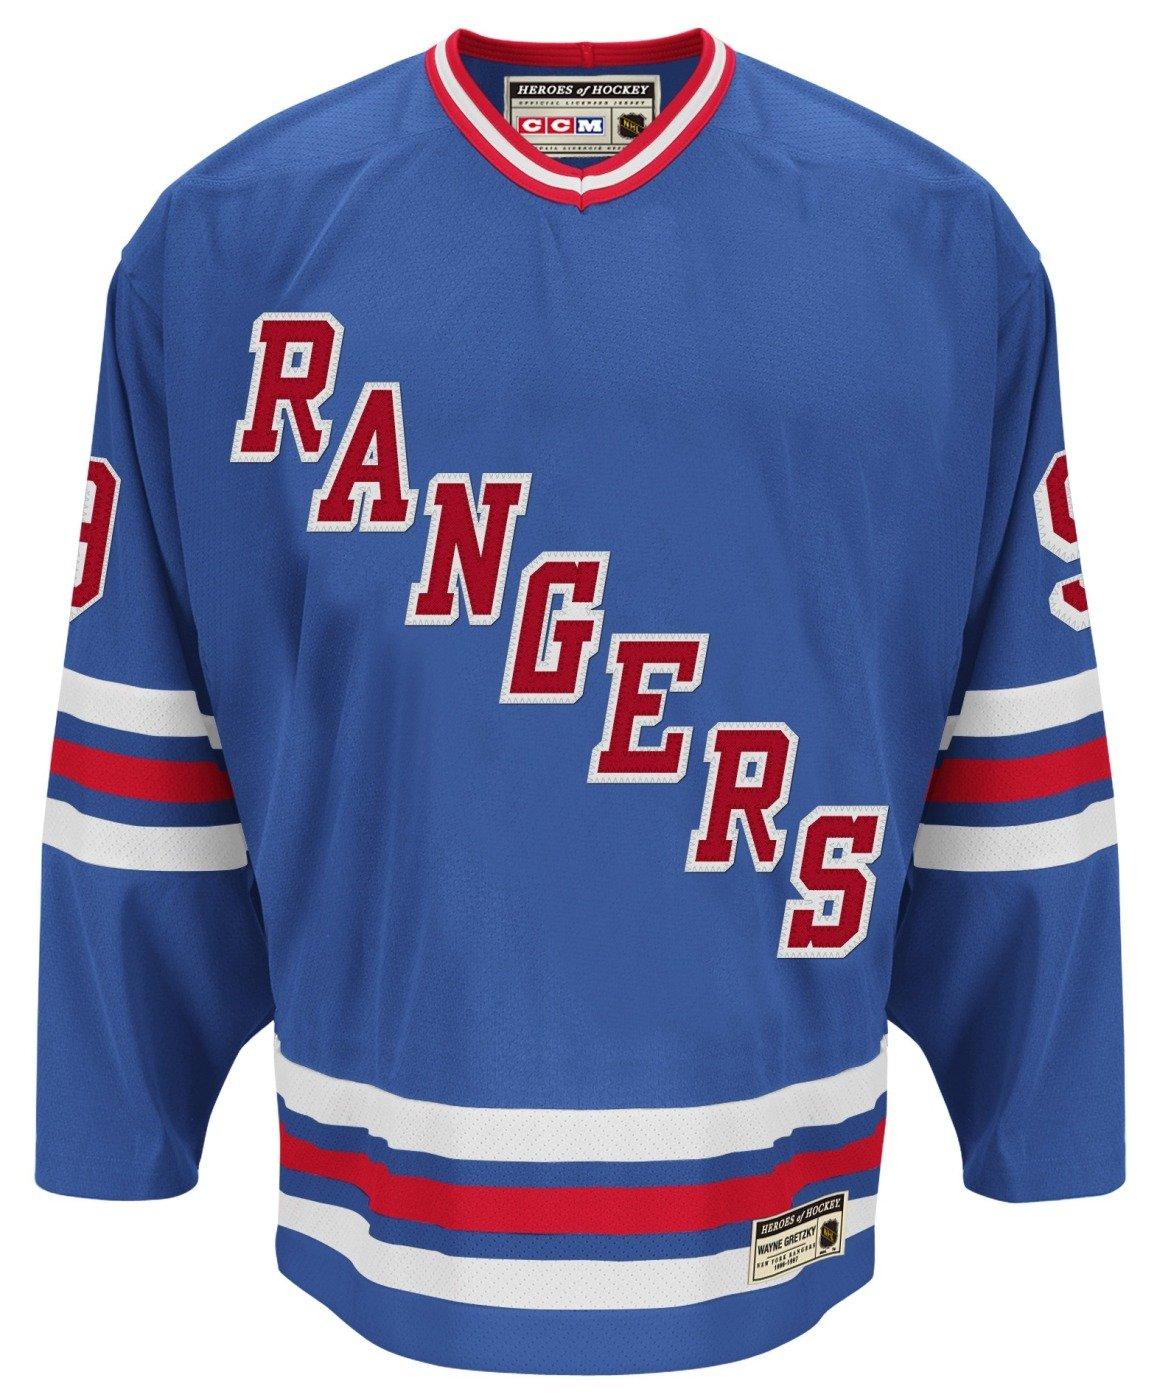 Amazon.com   CCM New York Rangers Wayne Gretzky Authentic Heroes of Hockey  Jersey   Sports   Outdoors fef101534